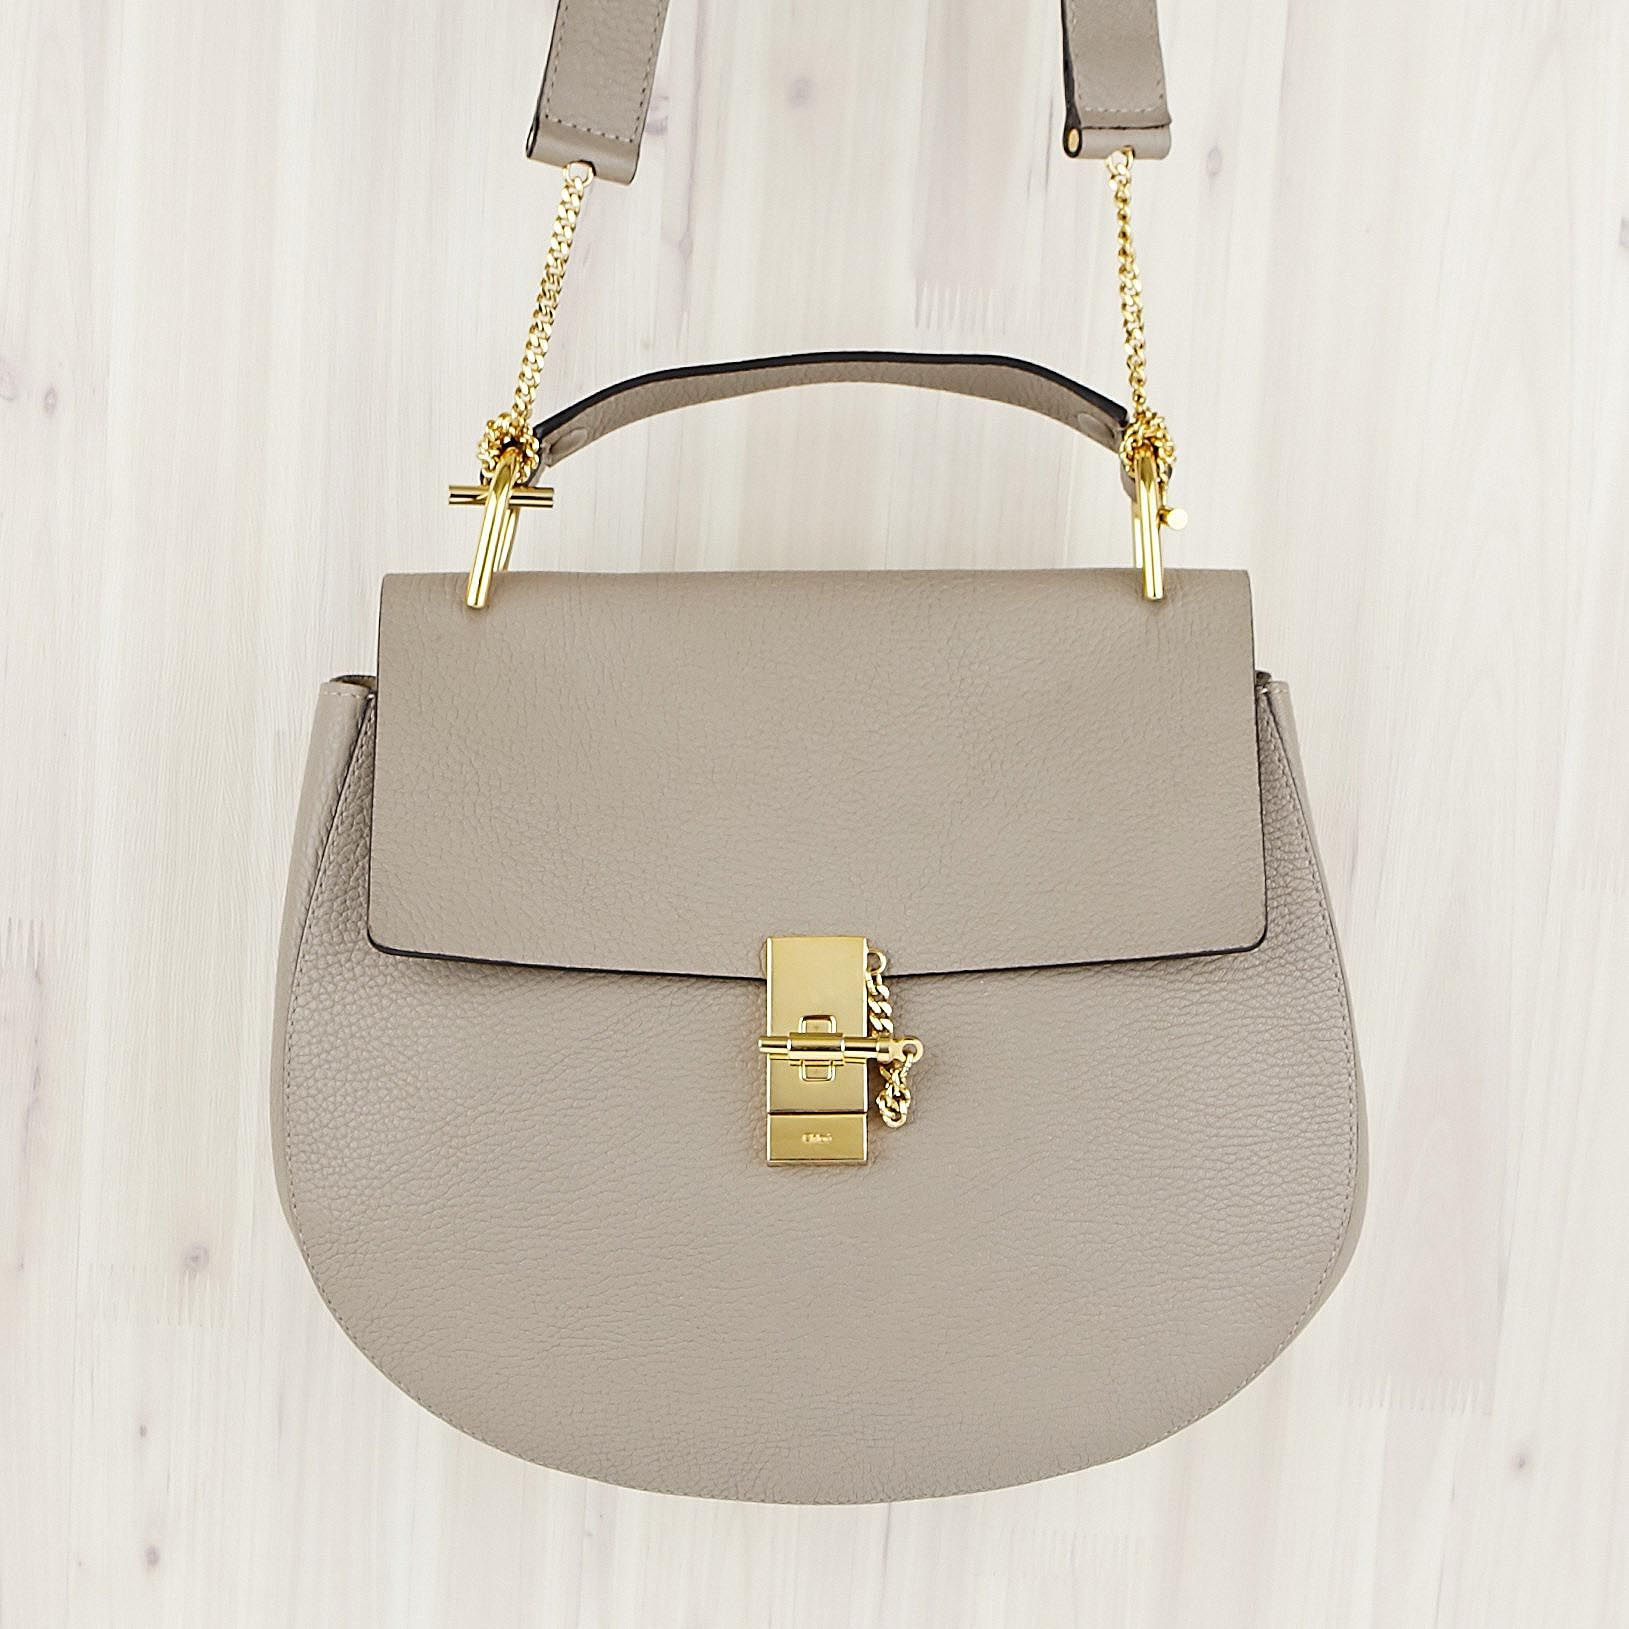 8fc190619f7485 The Chloe Drew bag is our instant favorite this season. - Yoogi's Closet   # Chloe